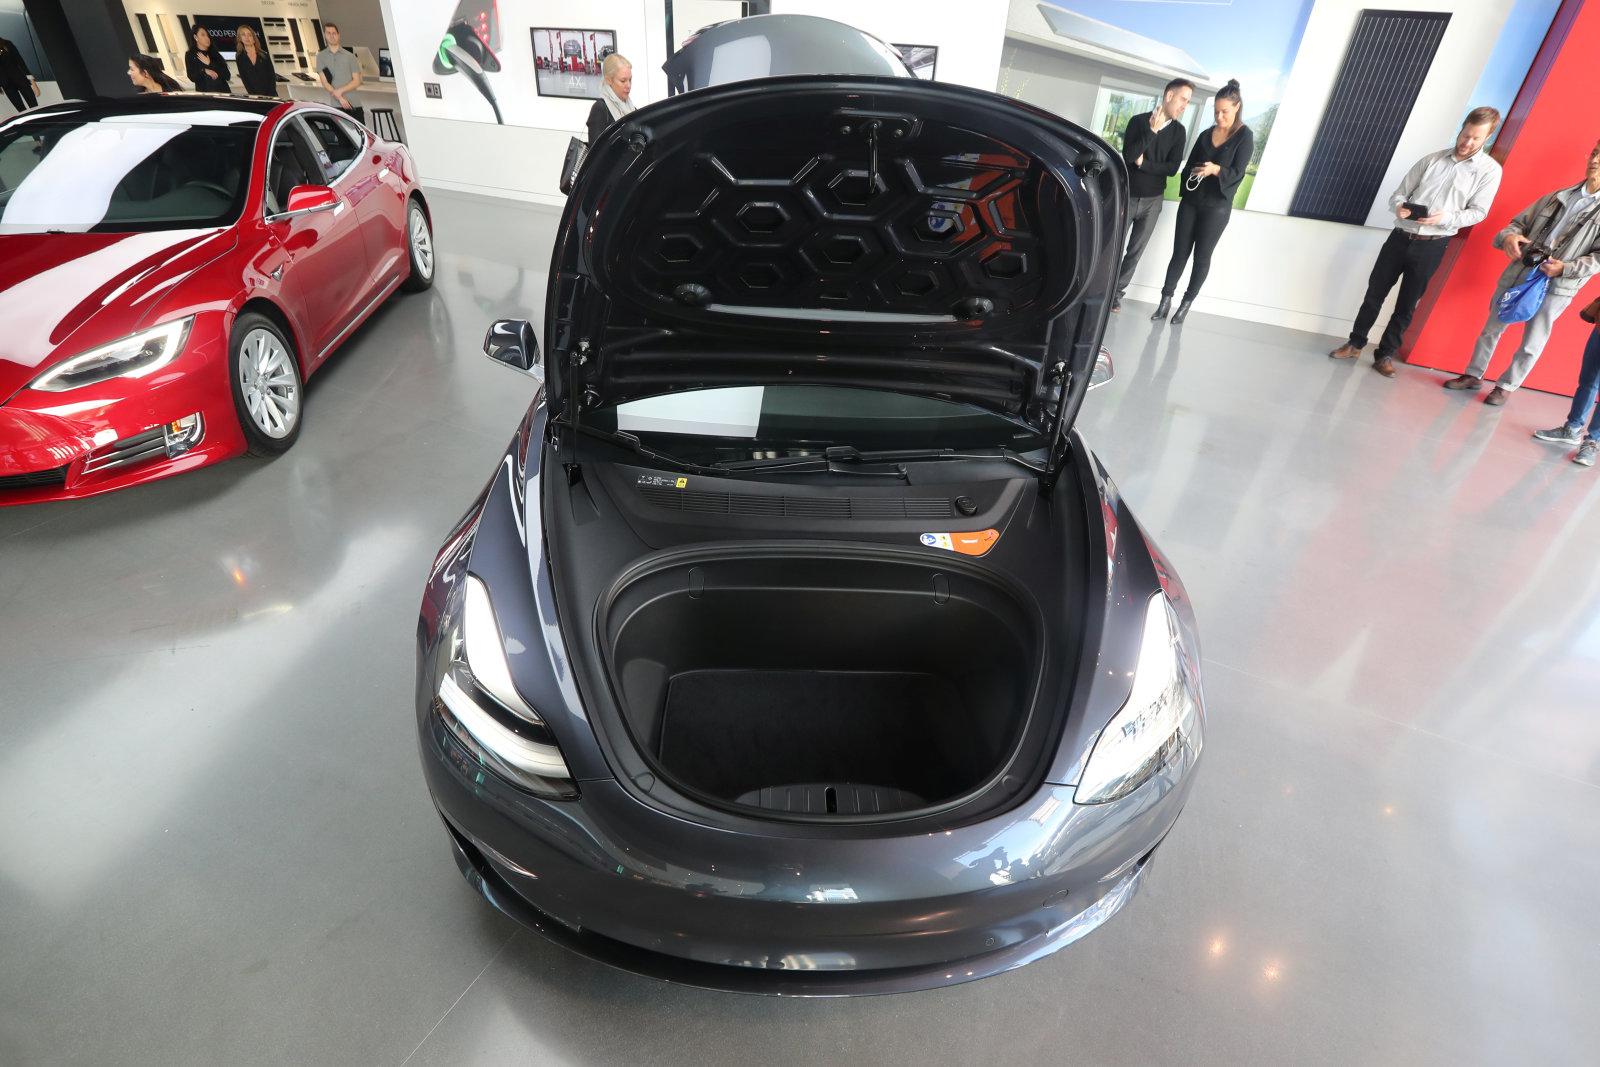 A Tesla Model 3 is seen in a showroom in Los Angeles, California U.S. January 12, 2018. REUTERS/Lucy Nicholson